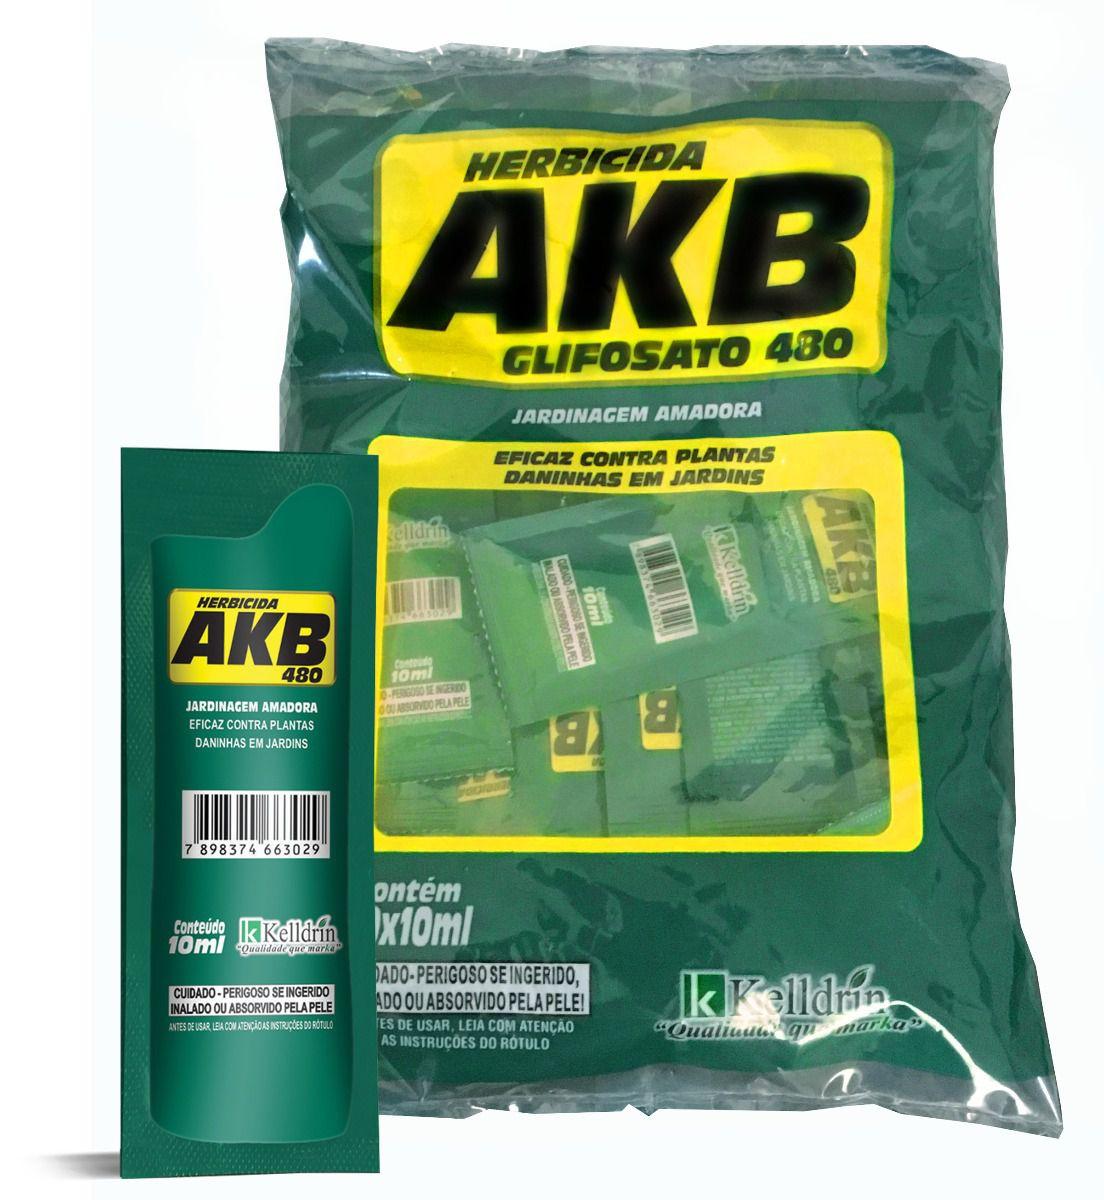 AKB 480 HERBICIDA -Glifosato 48% - 20x10ml - Kelldrin mata mato